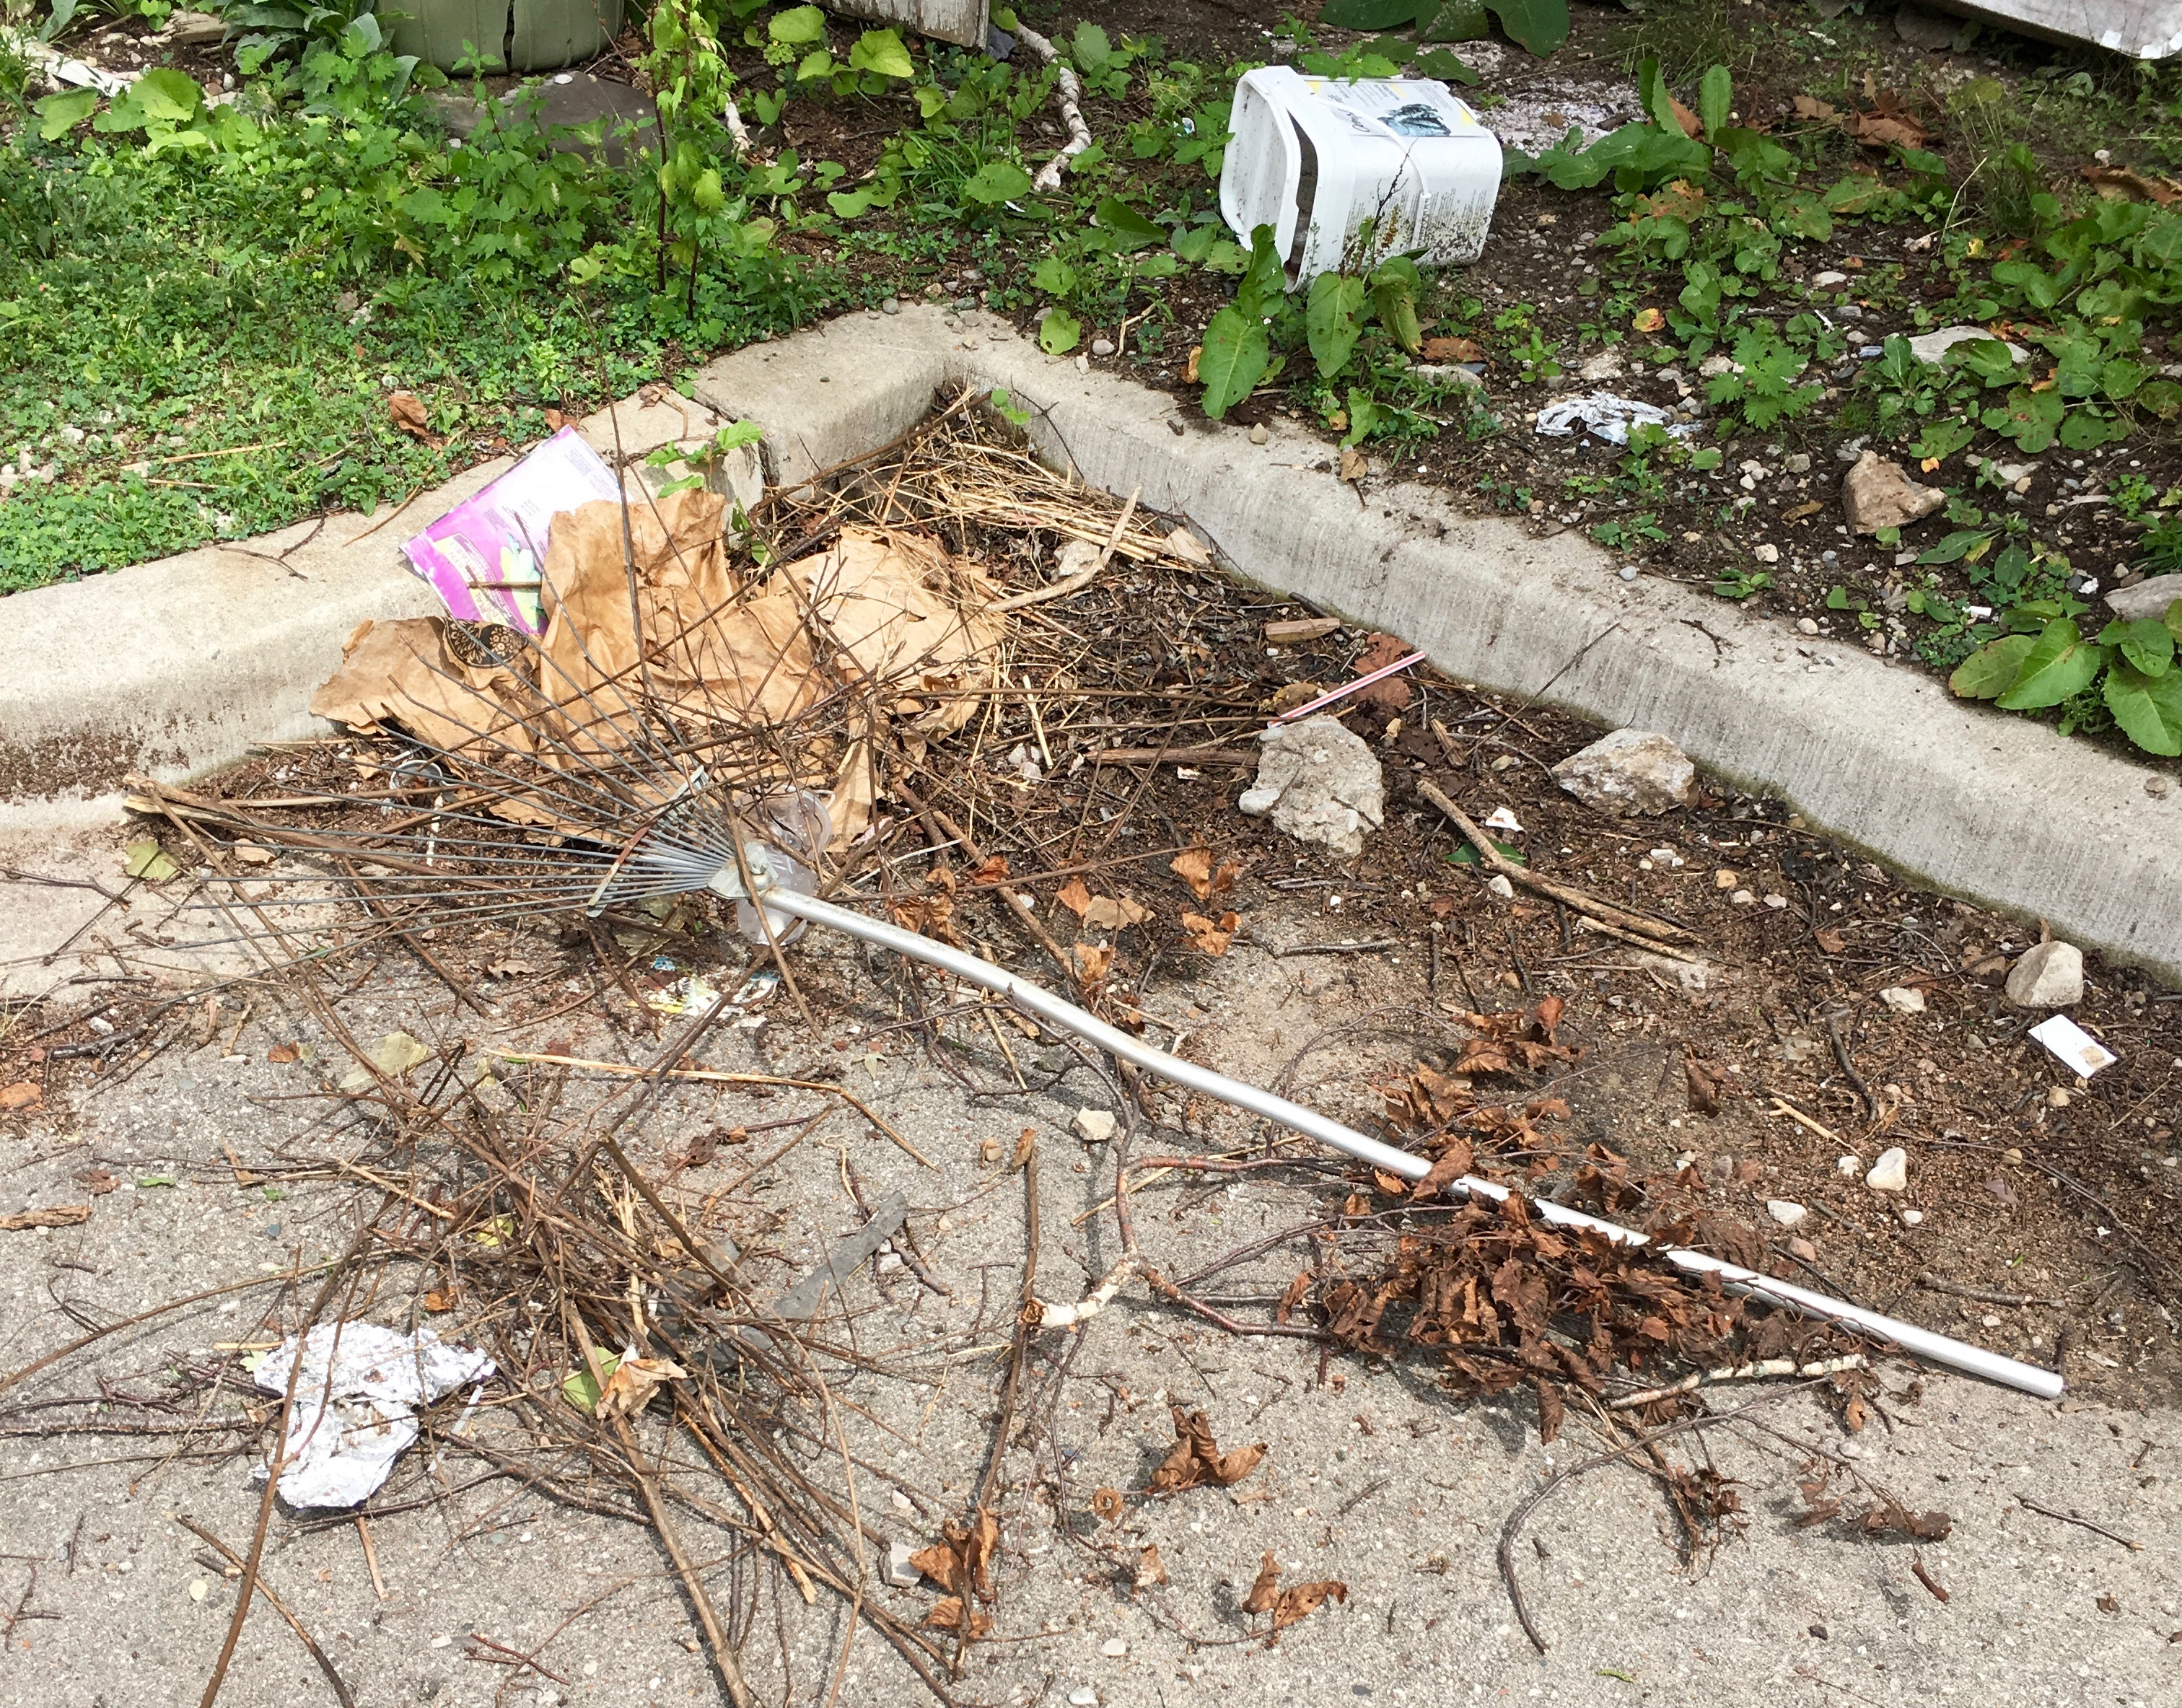 metal rake on concrete under twigs